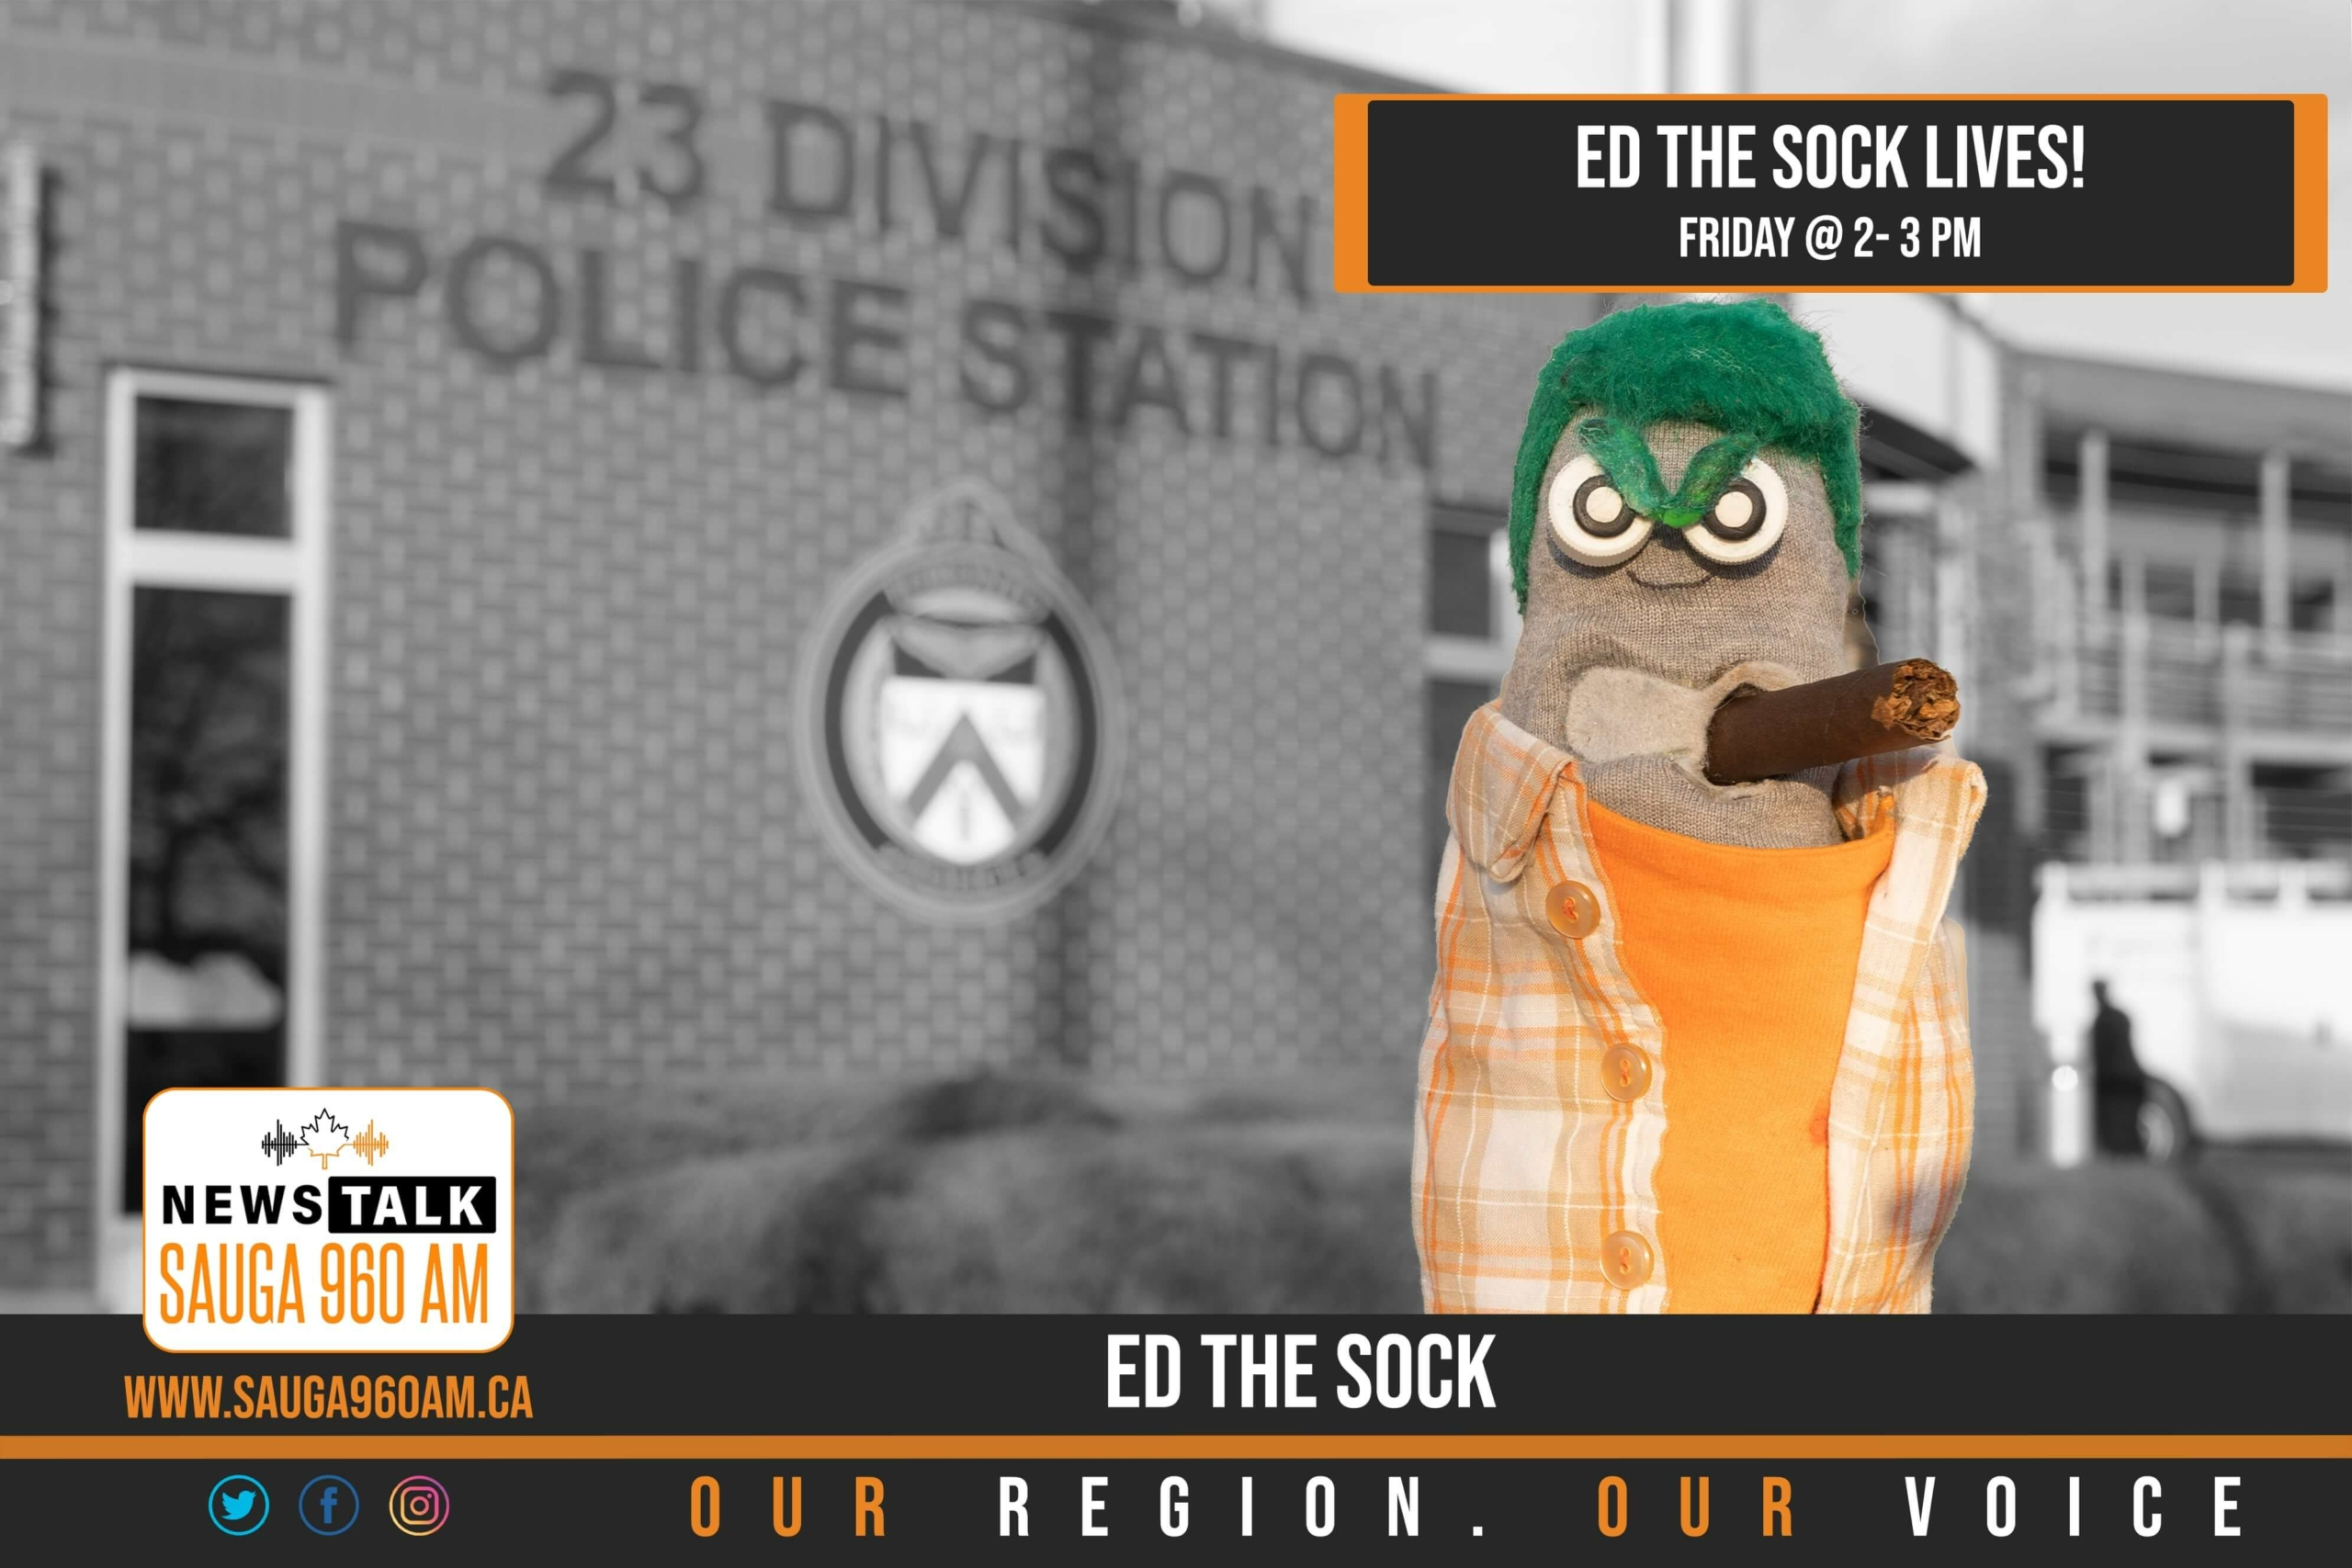 ed the sock lives